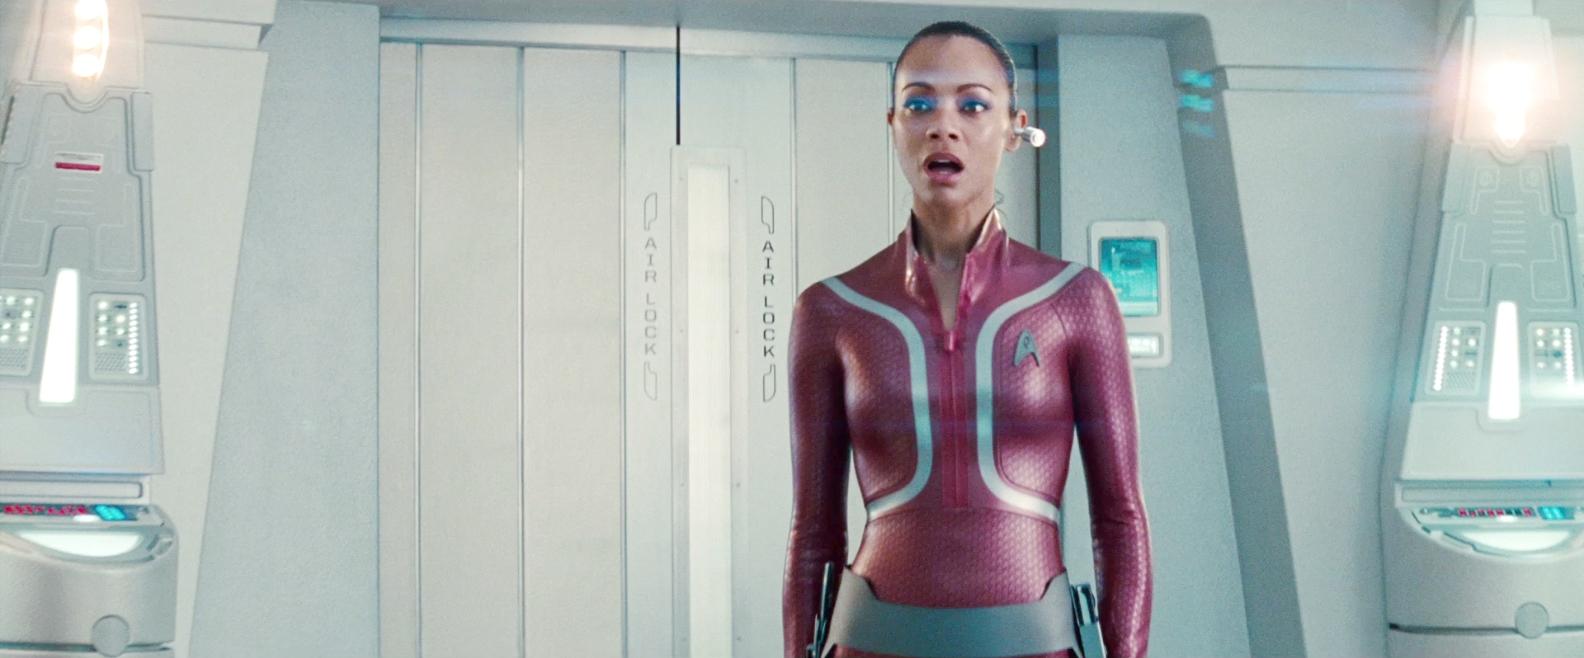 Trekkietar  Create Your Own Free Star Trek Avatars